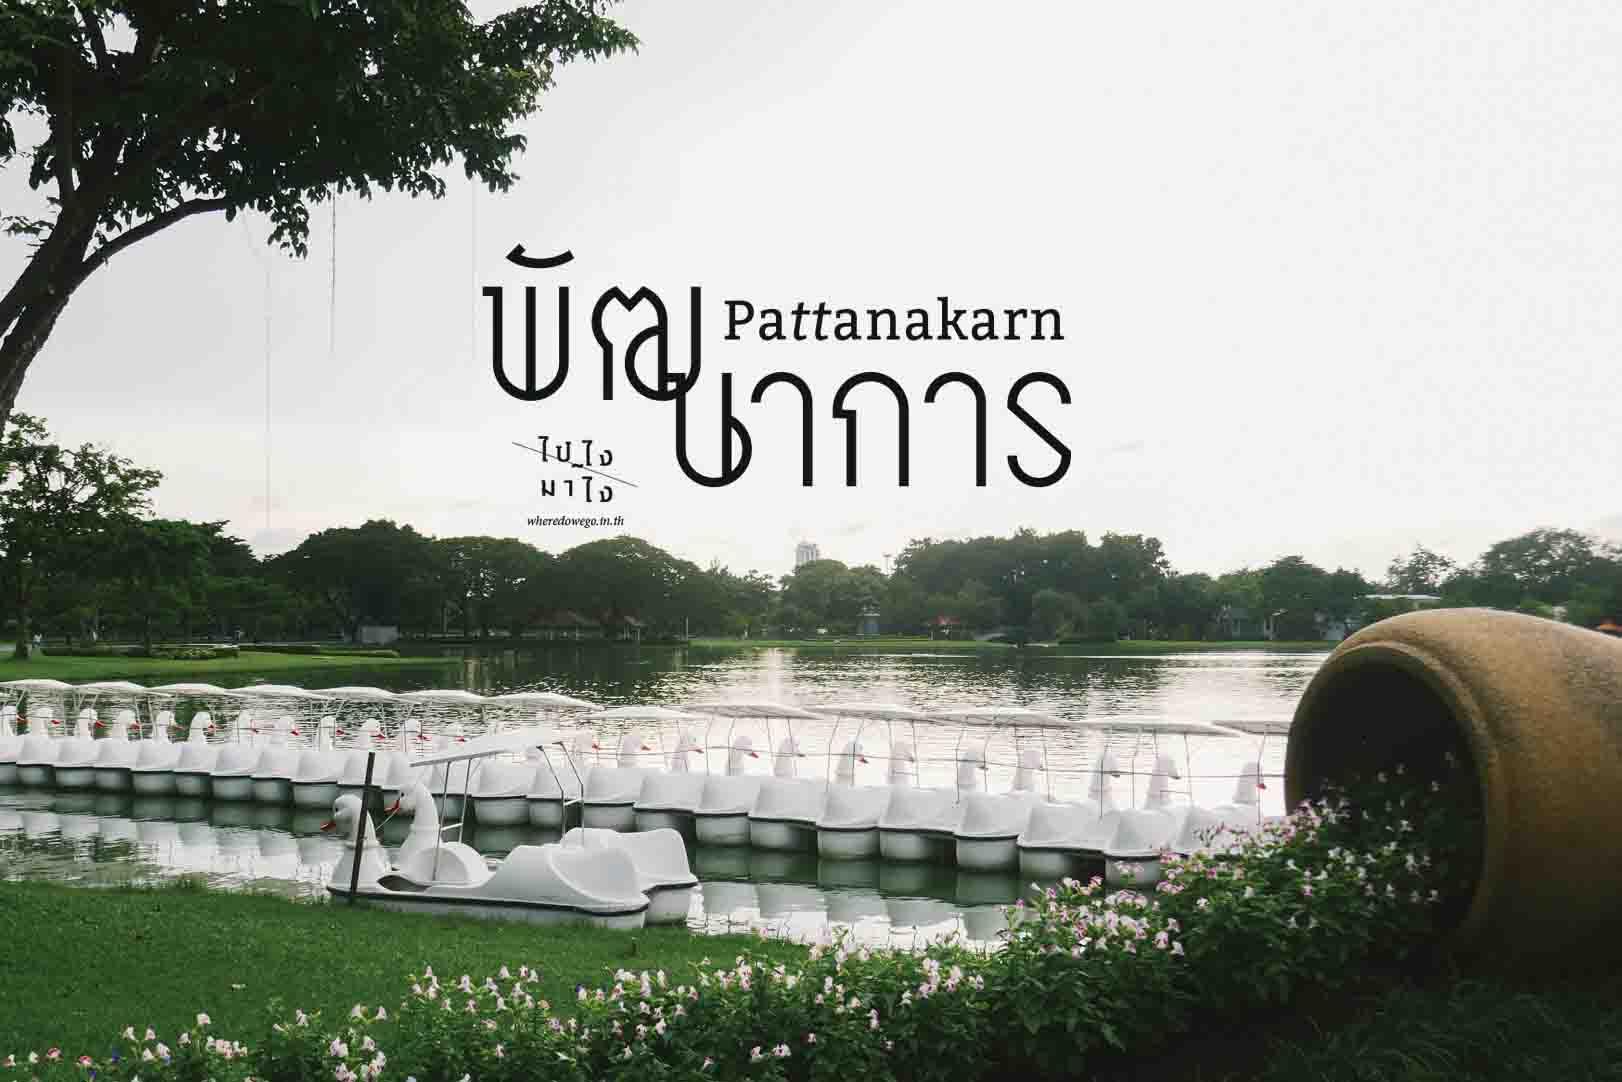 Pattanakarn – 7 ที่ชิคย่านพัฒนาการ